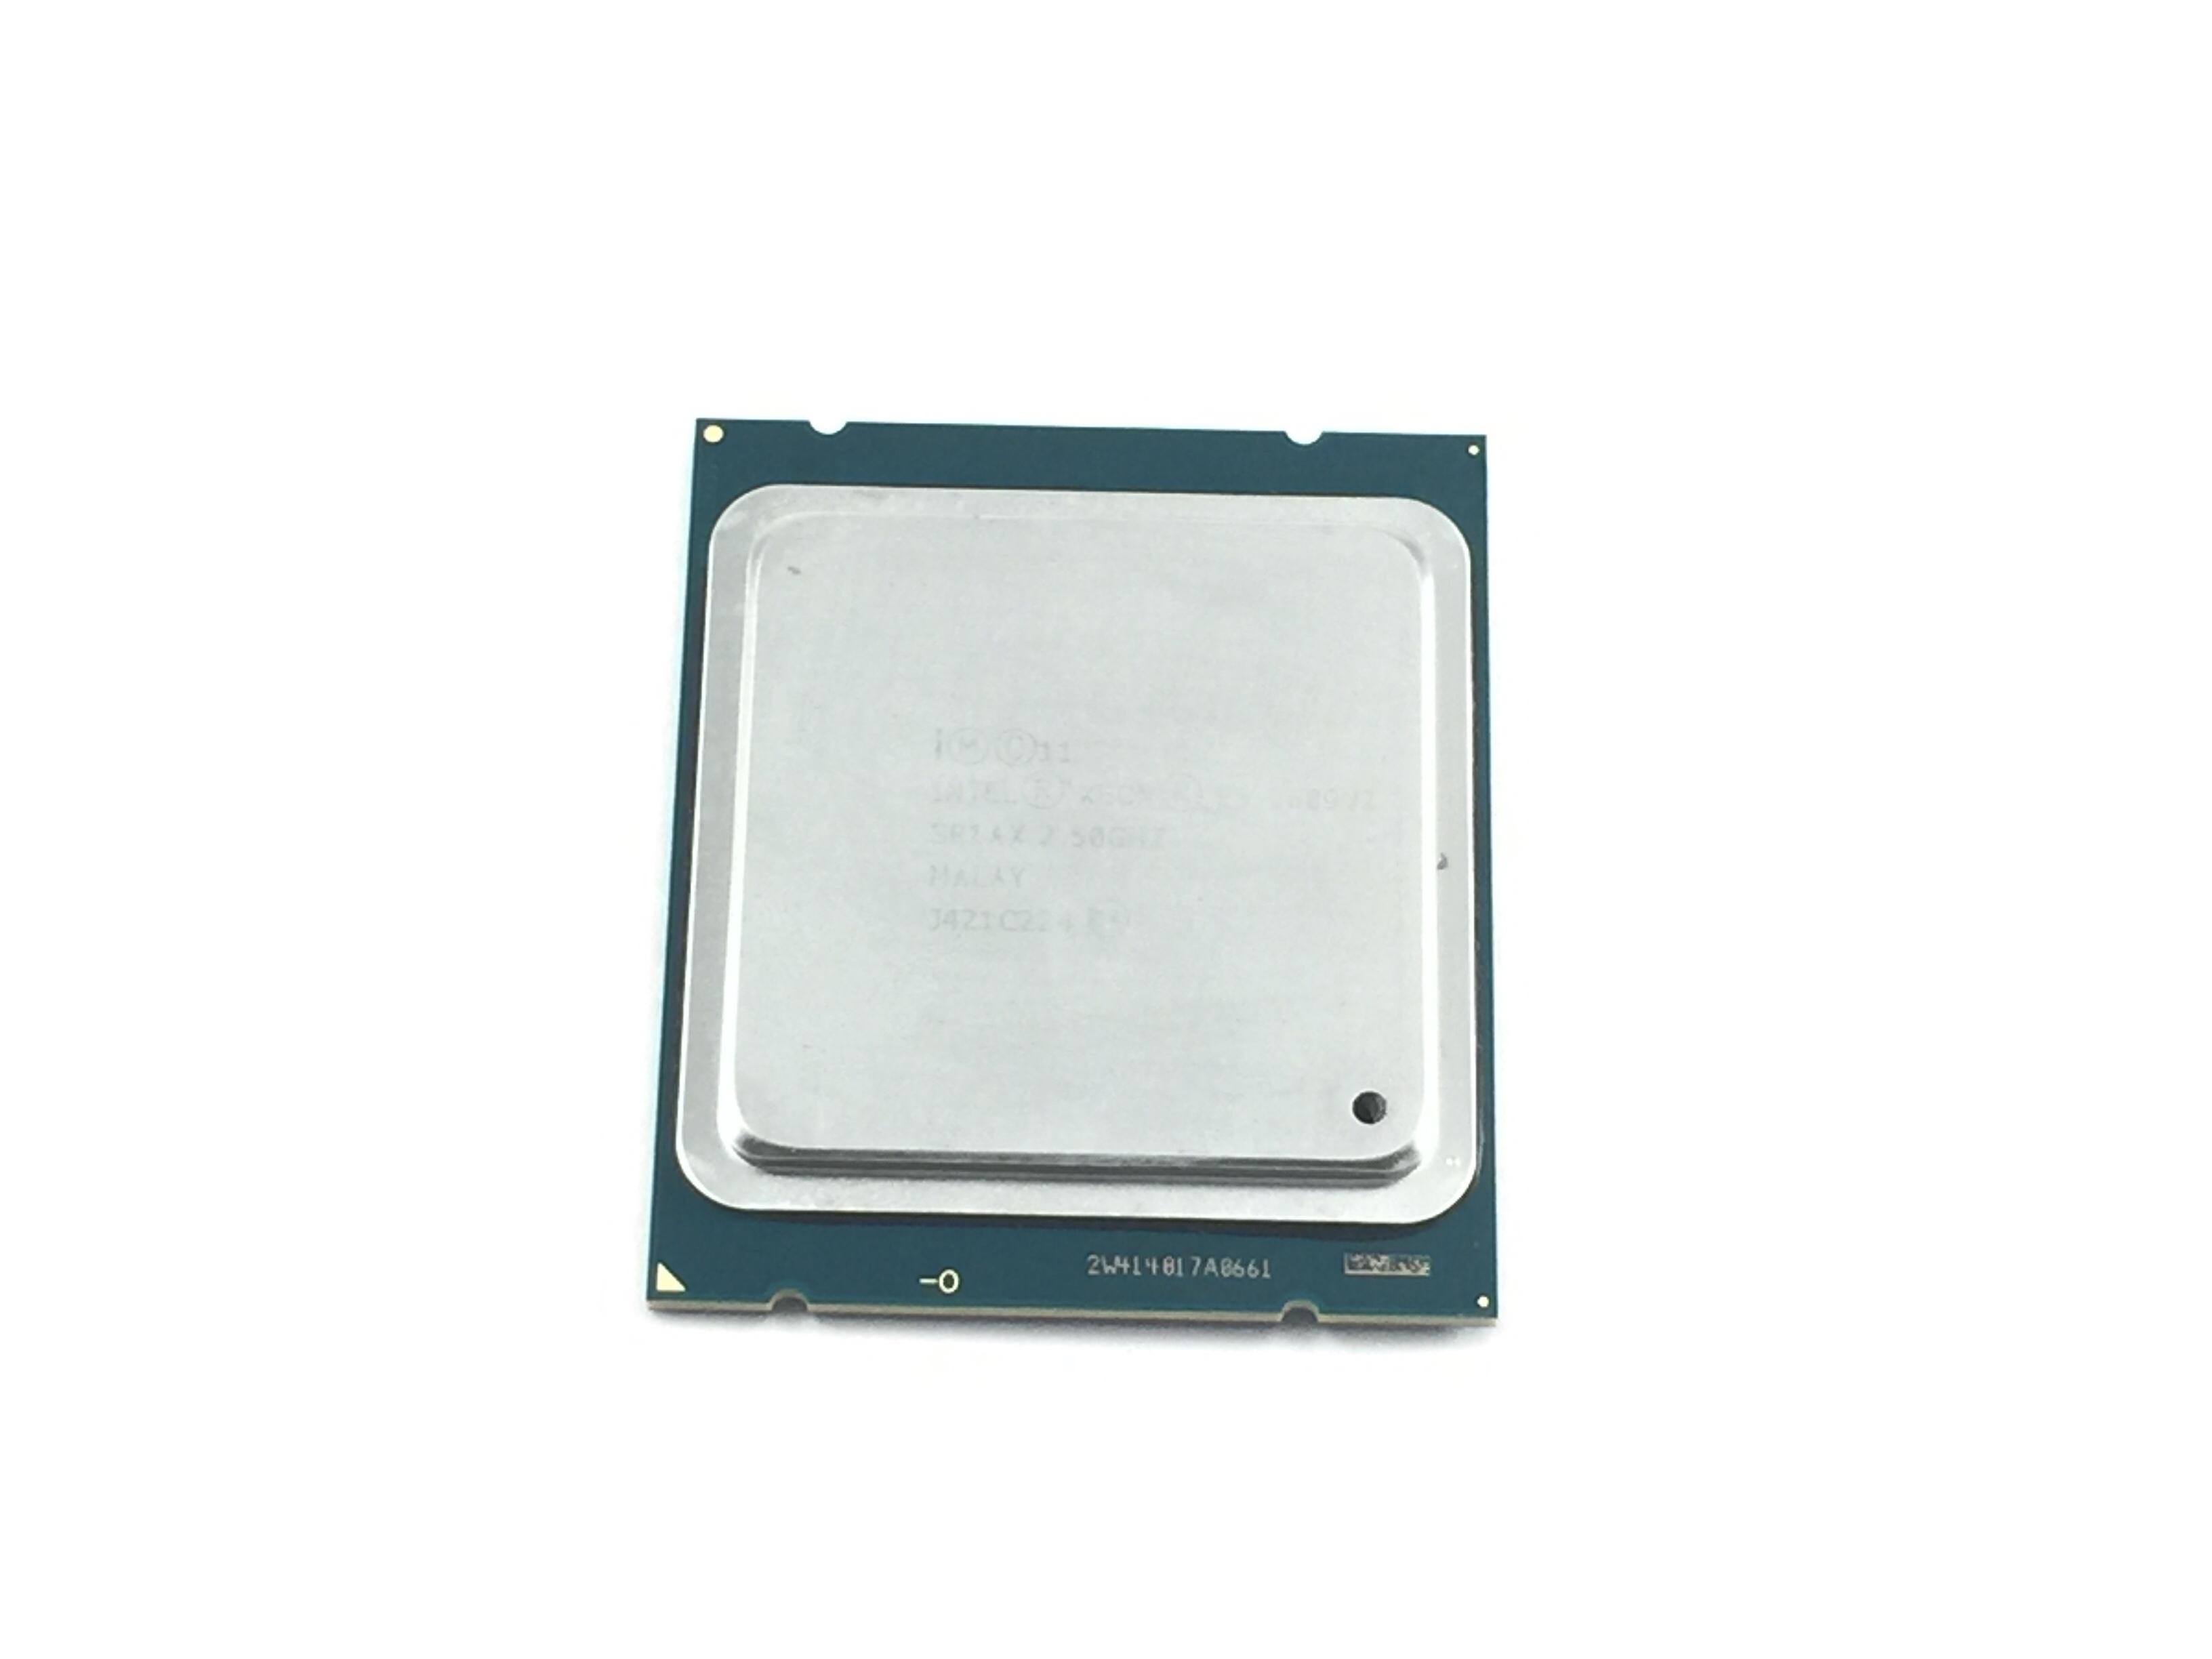 Intel Xeon E5-2609 v2 2.5GHz 4 Core 10MB LGA2011 CPU Processor (SR1AX)